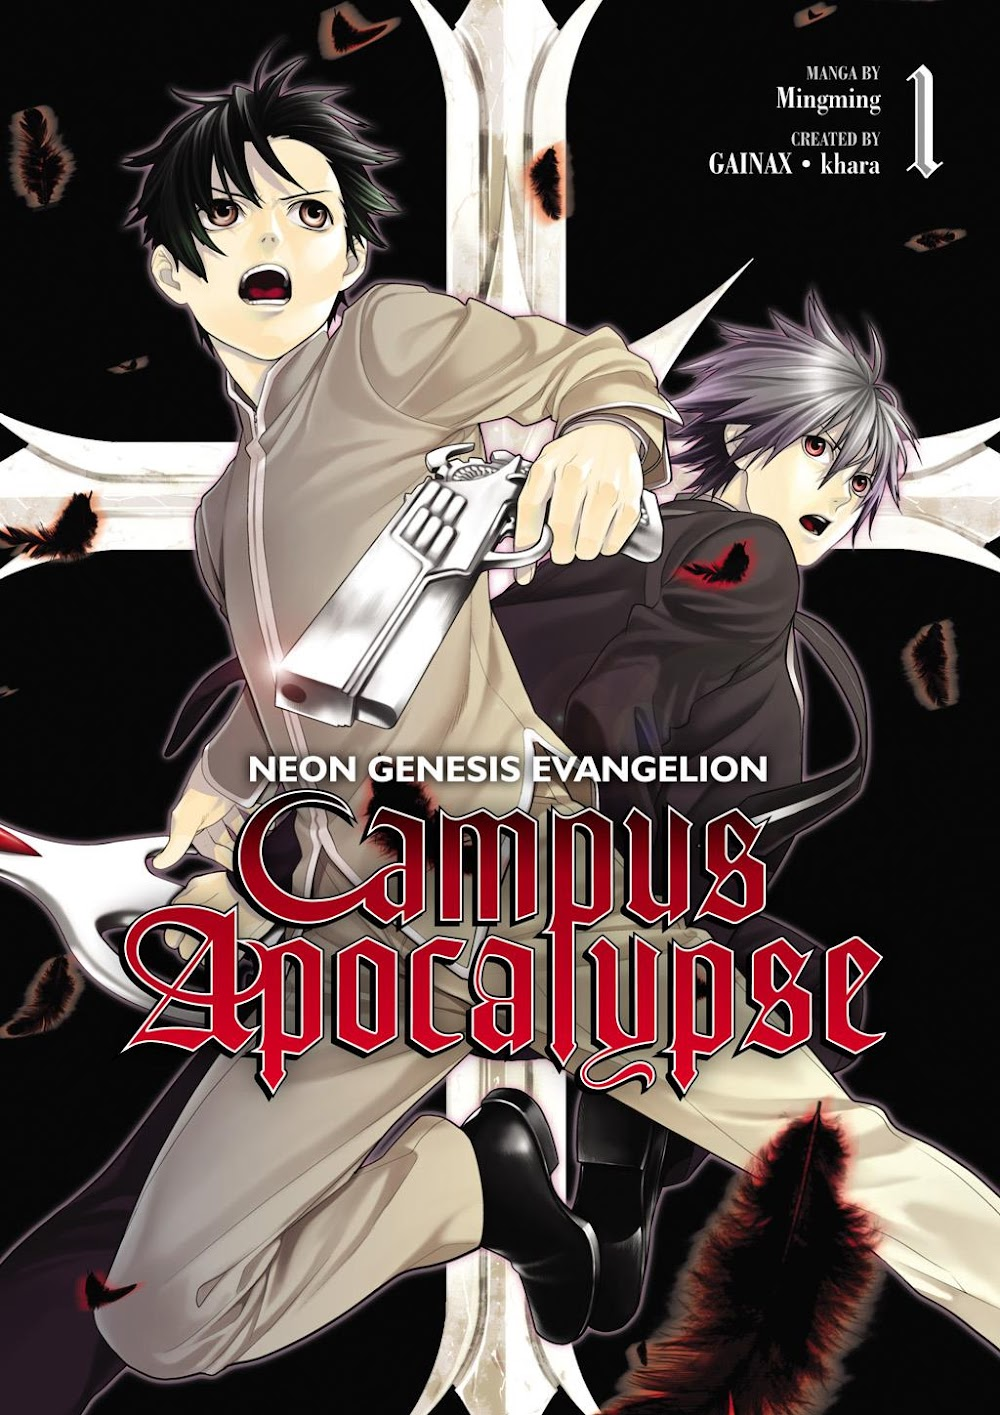 Neon Genesis Evangelion - Campus Apocalypse Vol. 1 (2010)